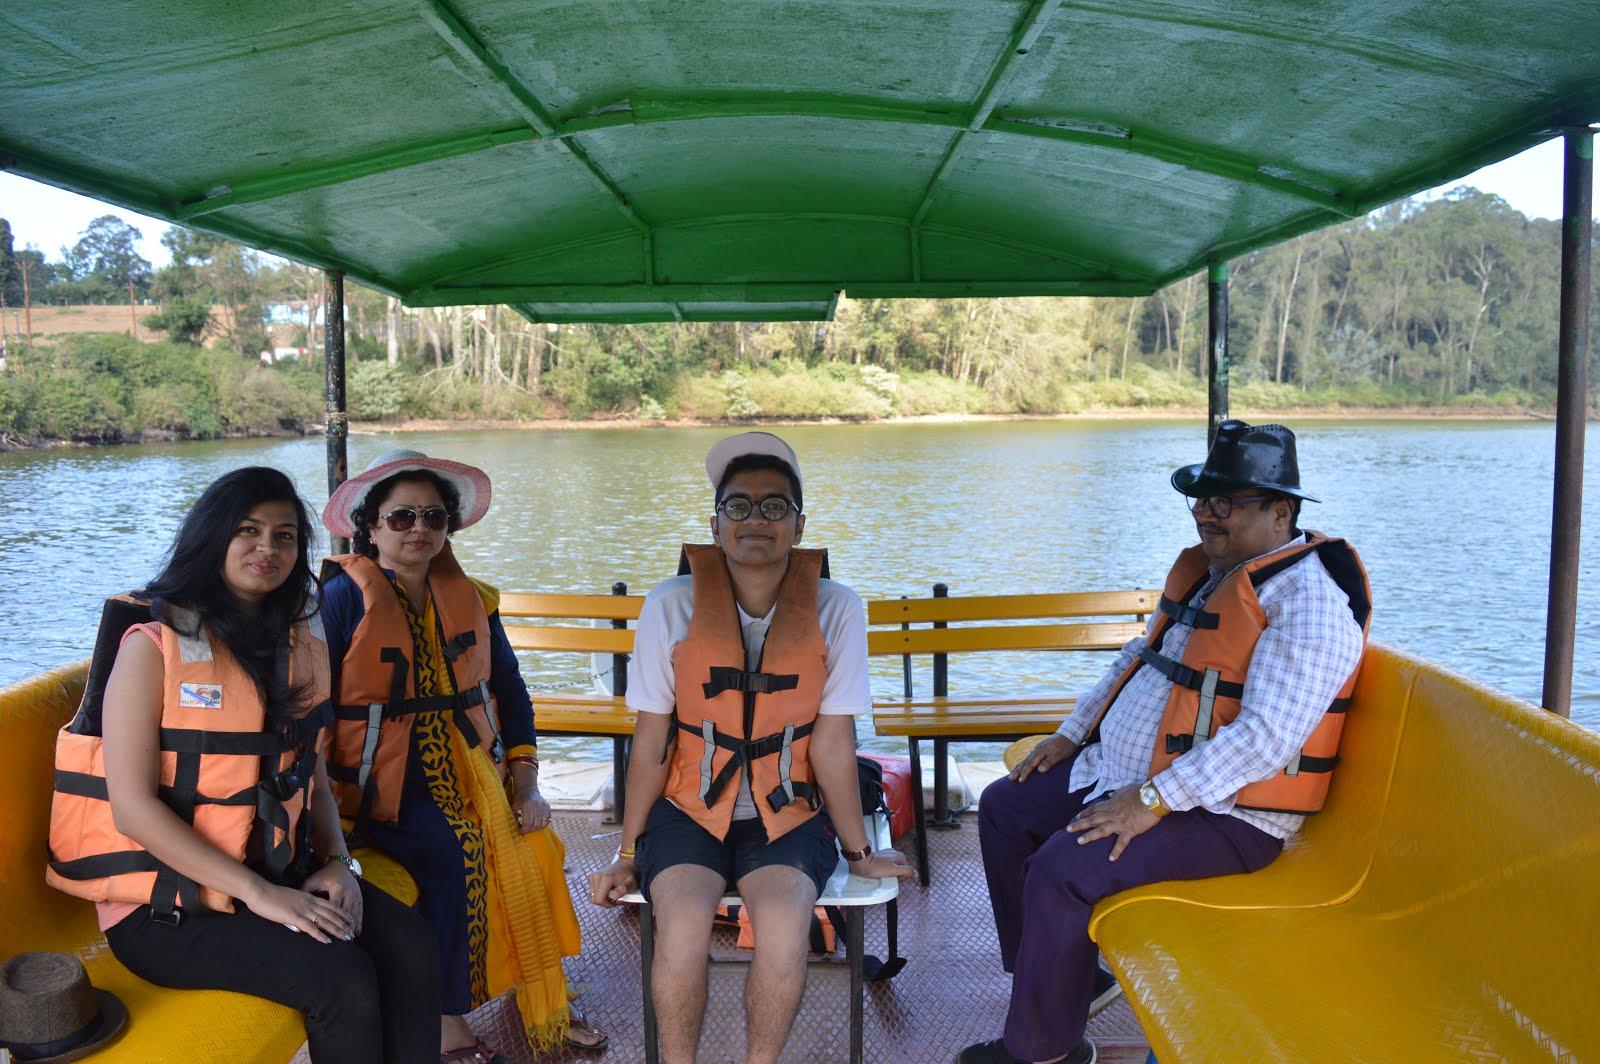 shiv sangal, ooty,lake